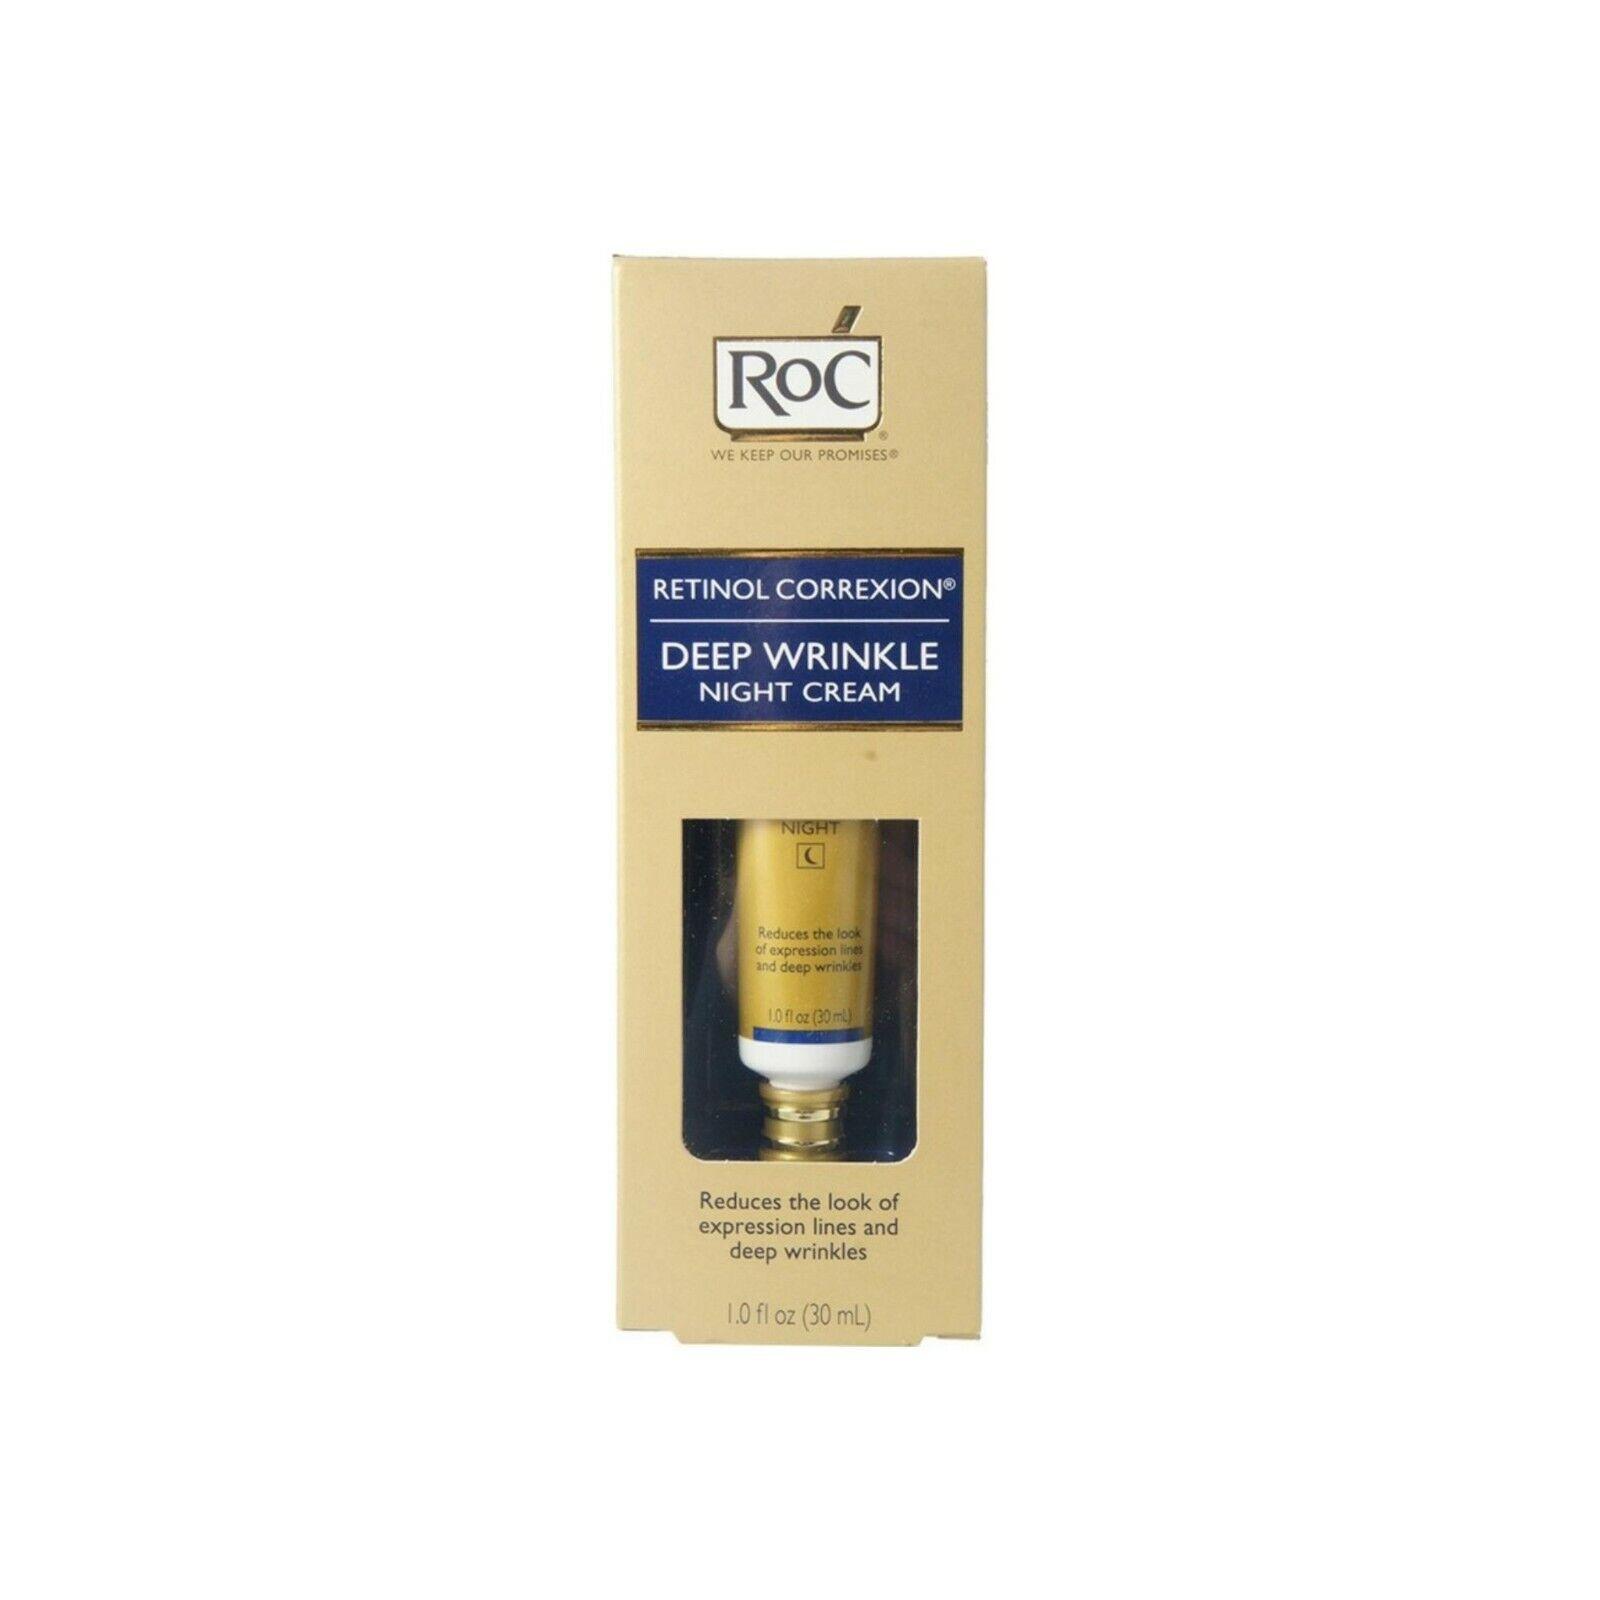 RoC Retinol Correxion Deep Wrinkle Anti-Aging Retinol Night